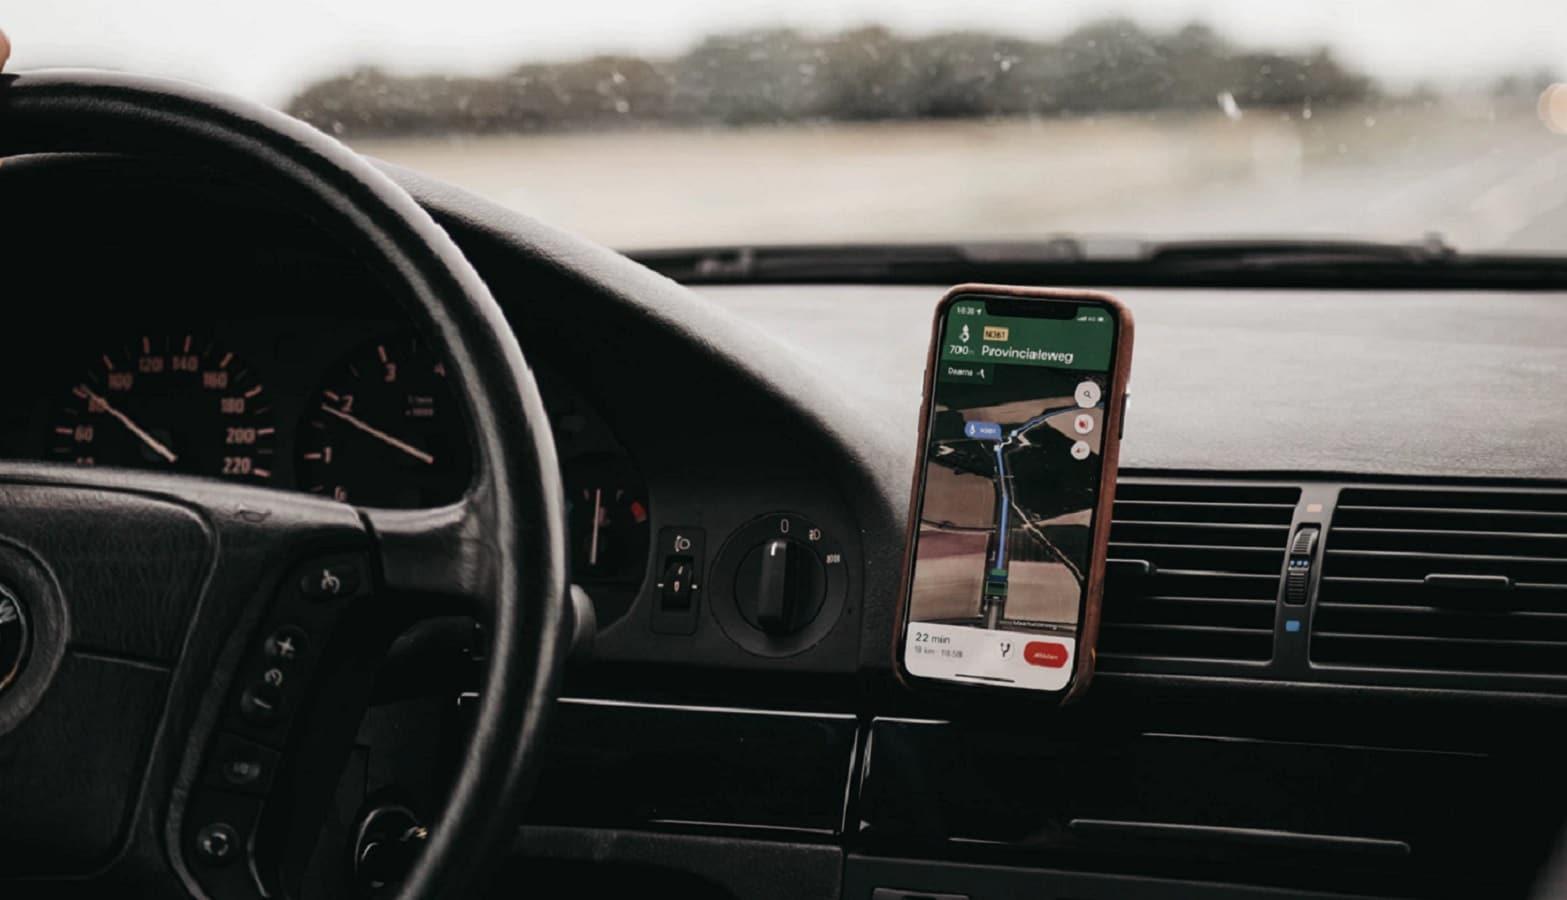 google maps on dash in car